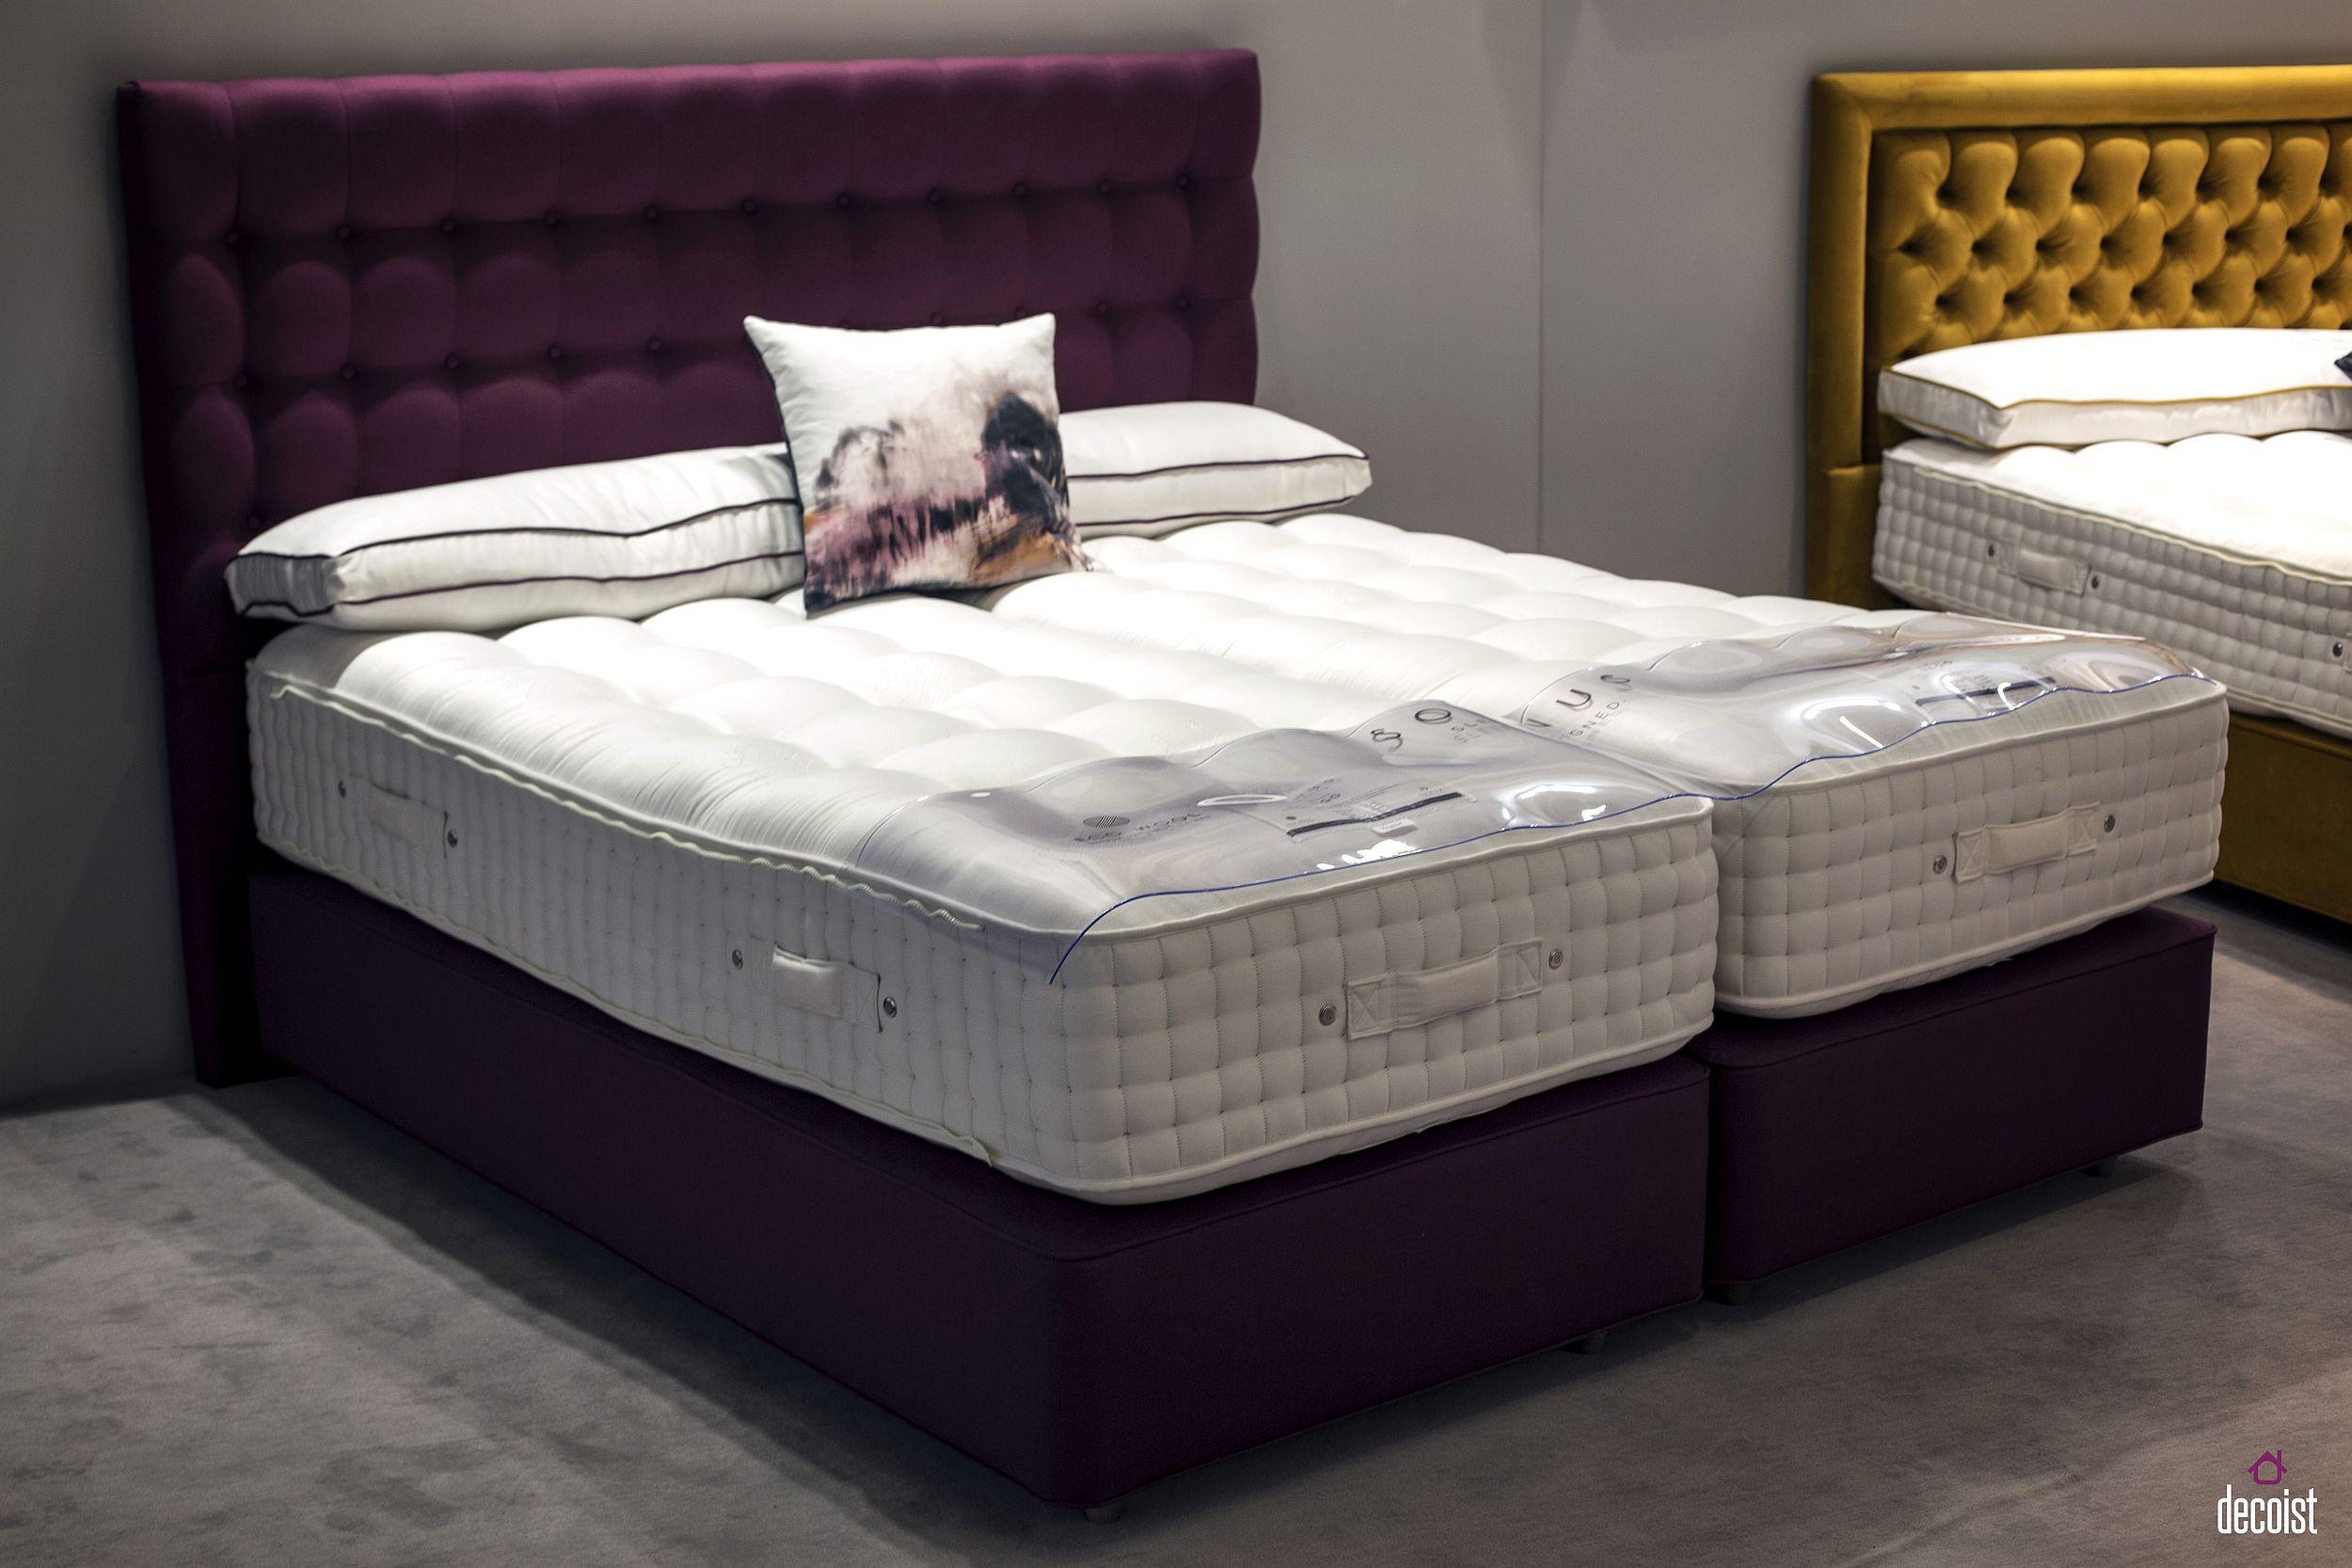 Bright-purple-headboard-and-bed-frame-idea